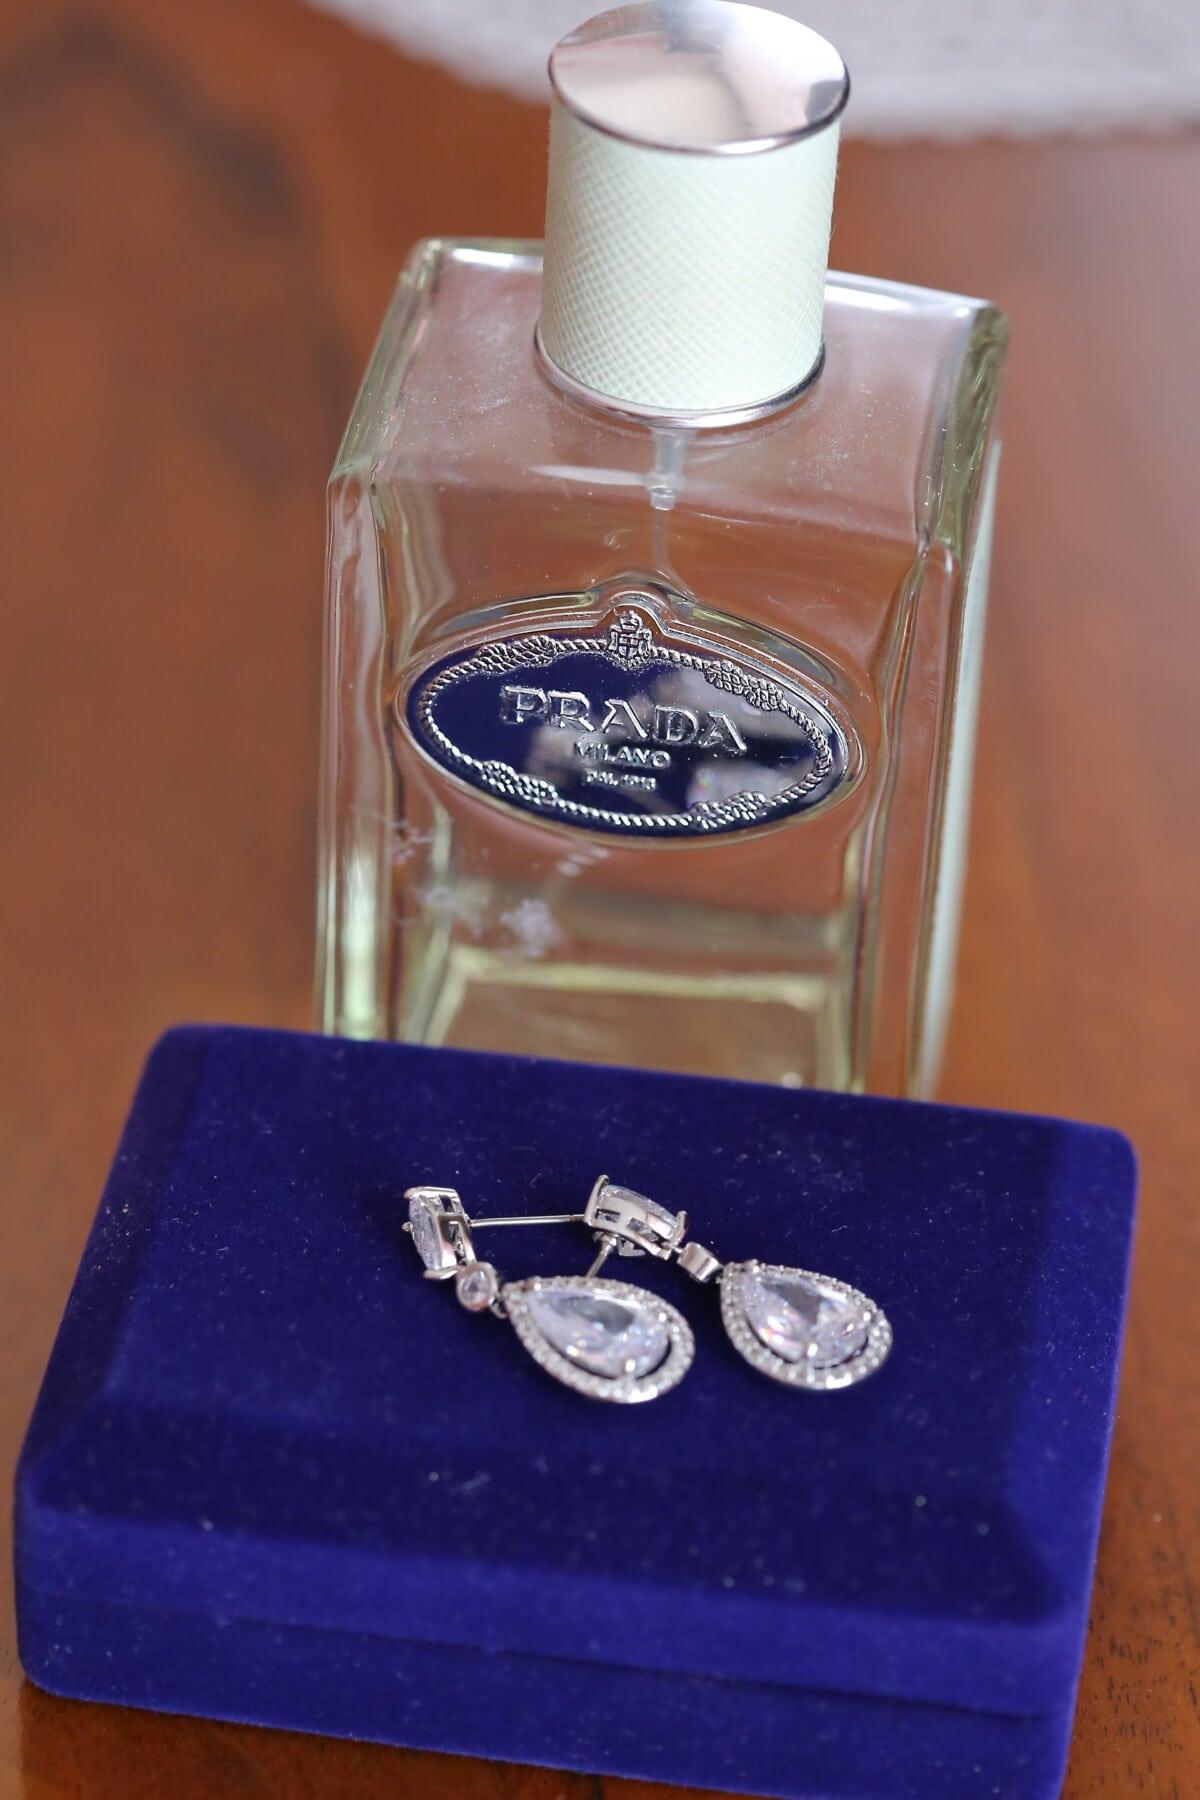 luxury, famous, perfume, fragrance, bottle, jewelry, jewel, platinum, earrings, elegant